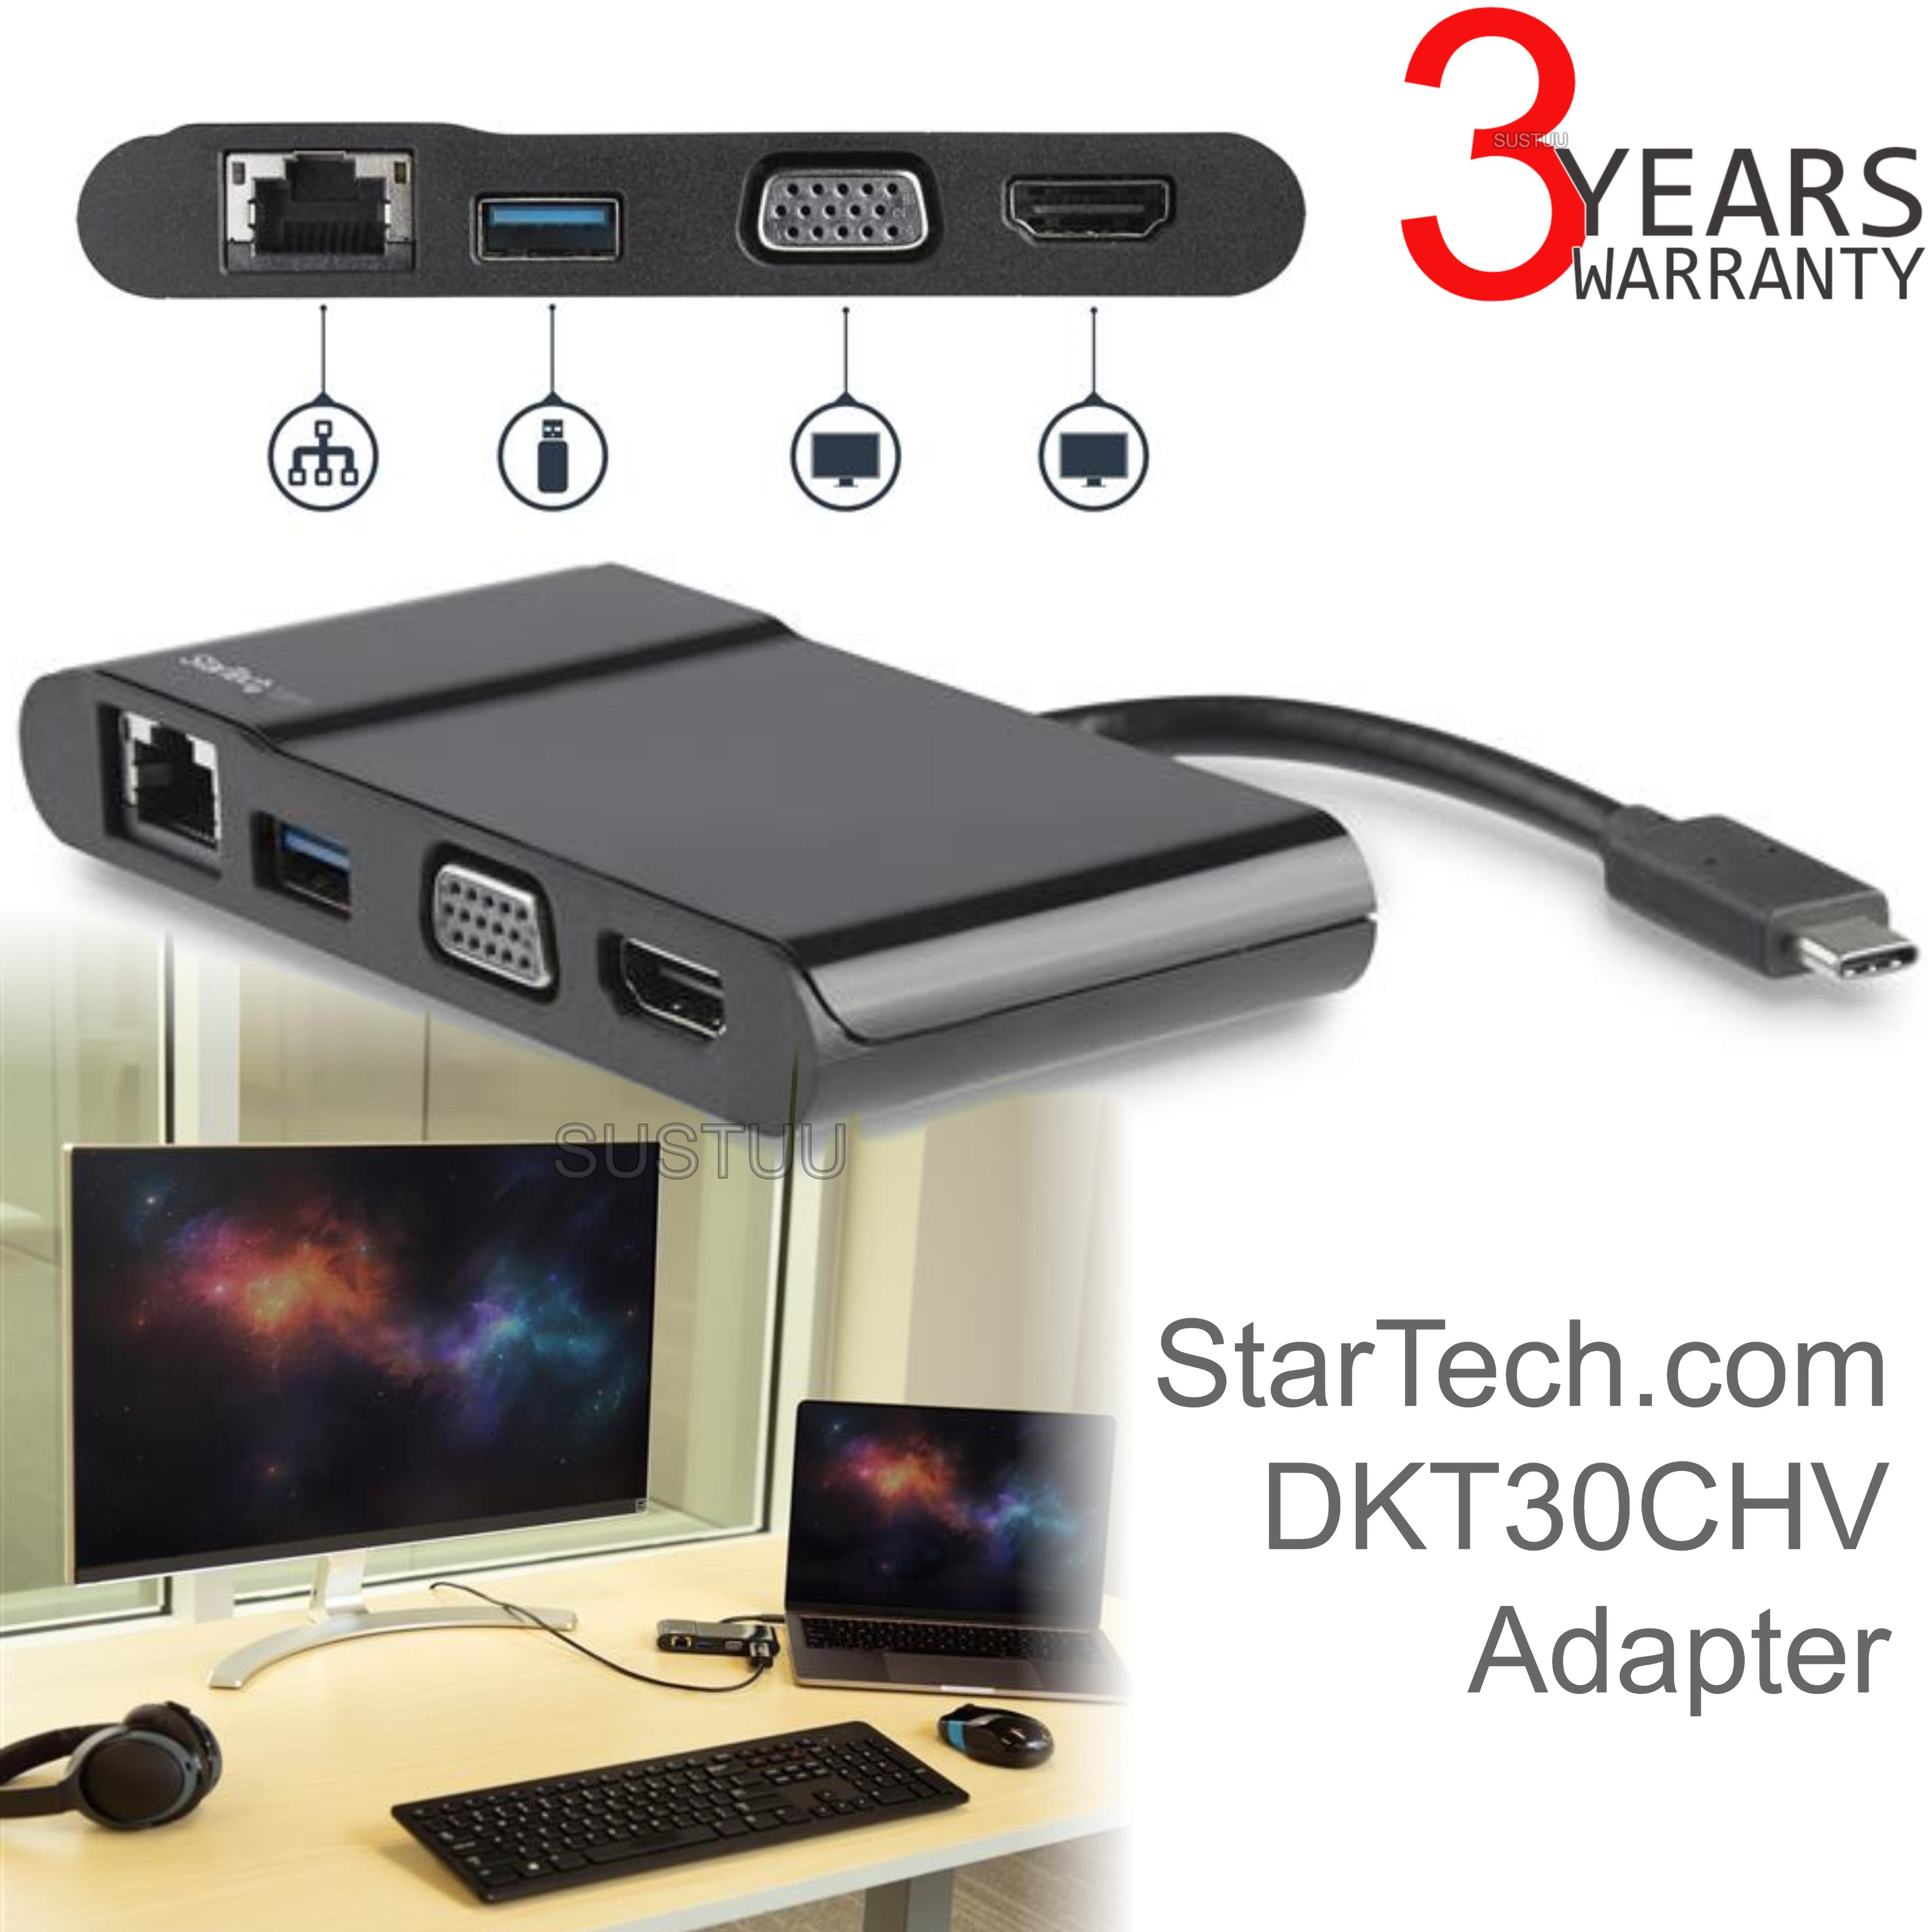 StarTech USB Type-C to 3.0/4K HDMI/VGA/Gigabit Ethernet Multiport Adapter | For Laptops